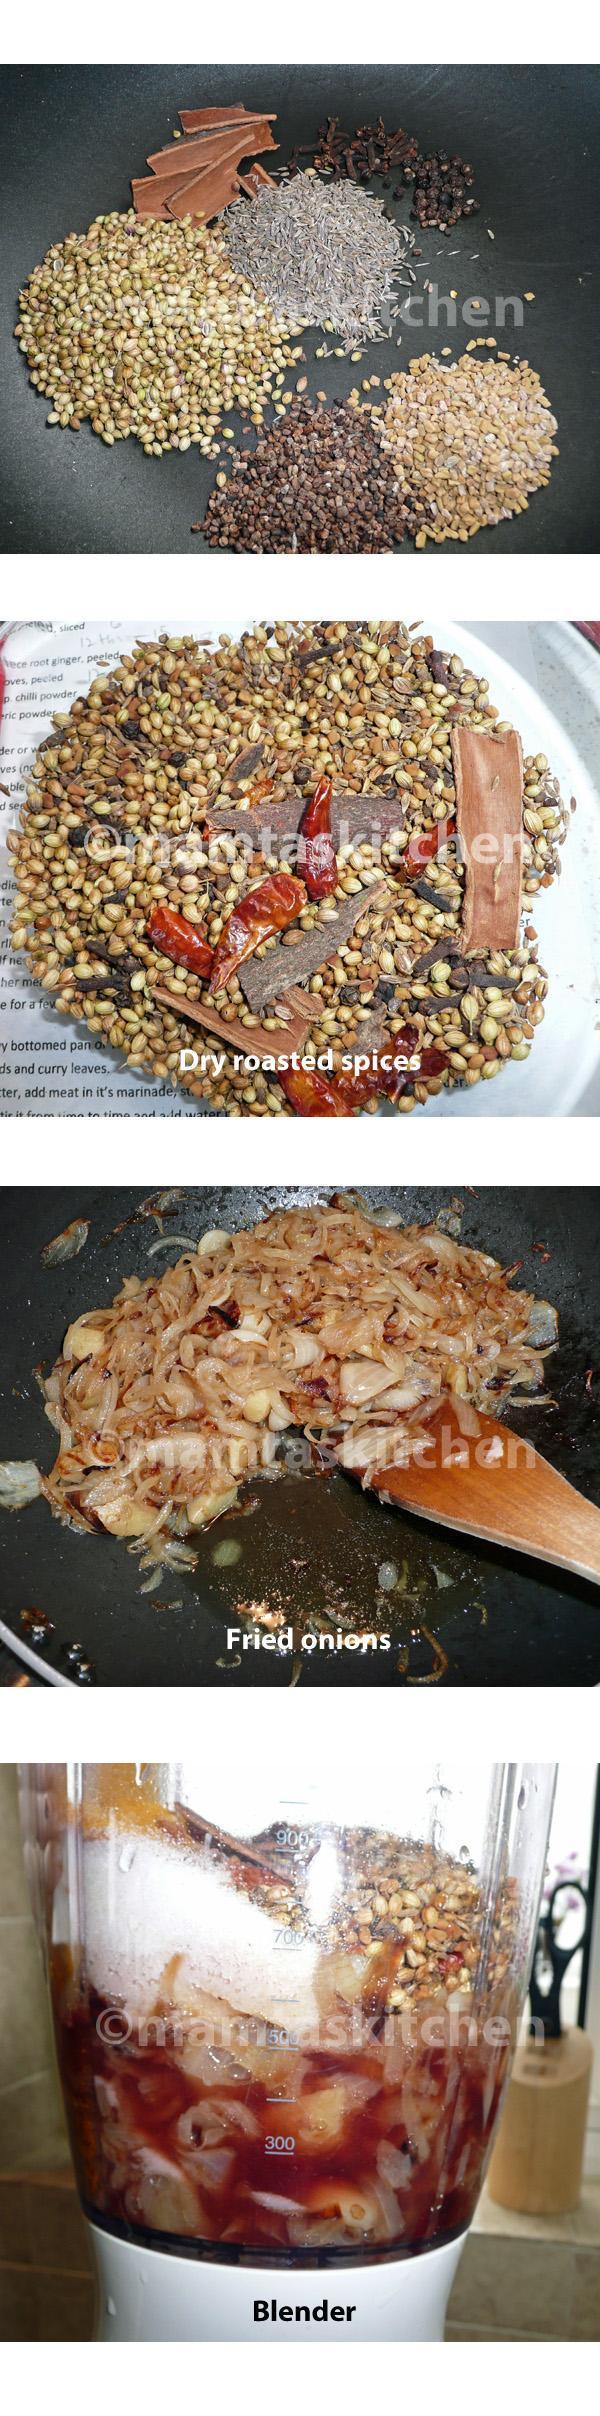 Vindaloo Pork or Beef or Lamb Curry 1, Traditional Method